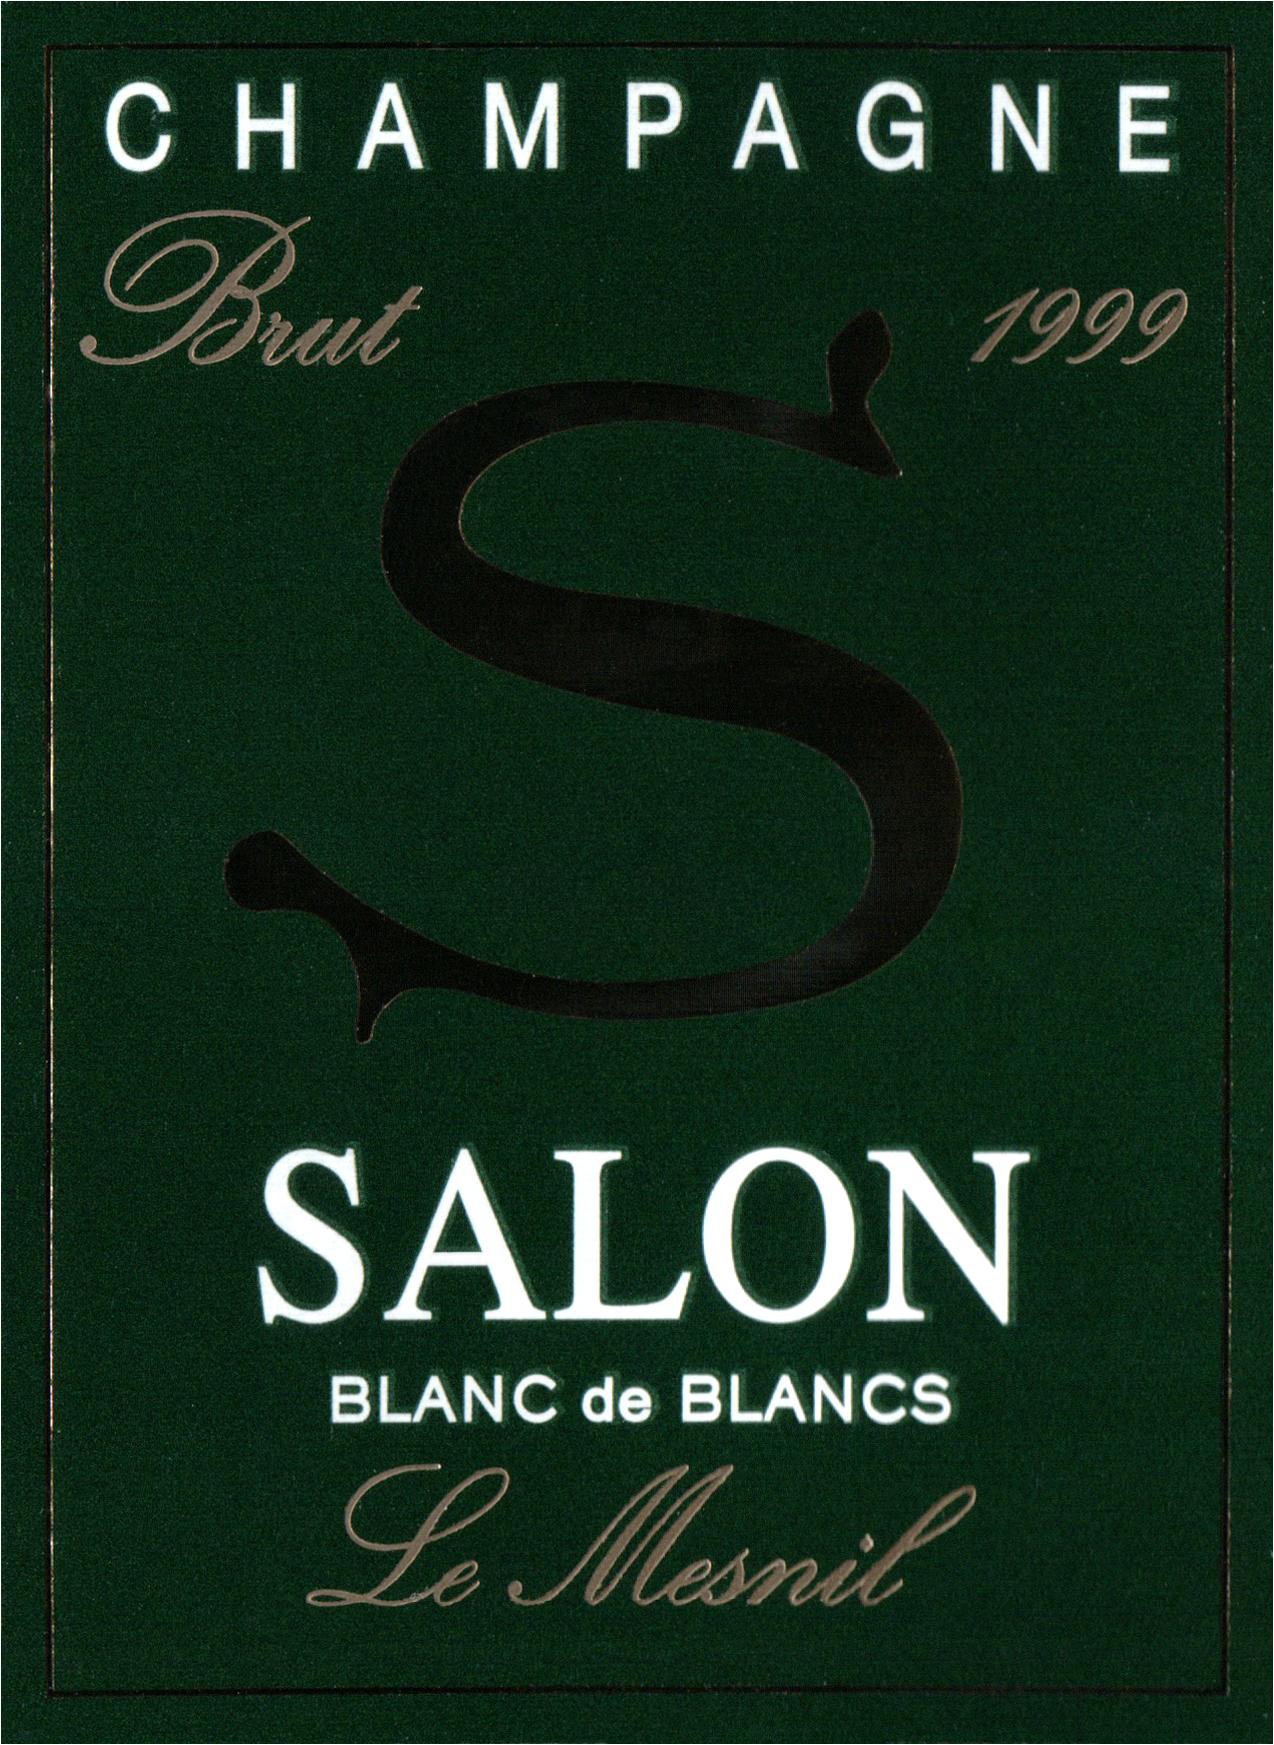 1999 Salon Le Mesnil Blanc De Blancs Grand Cru | Wine Library